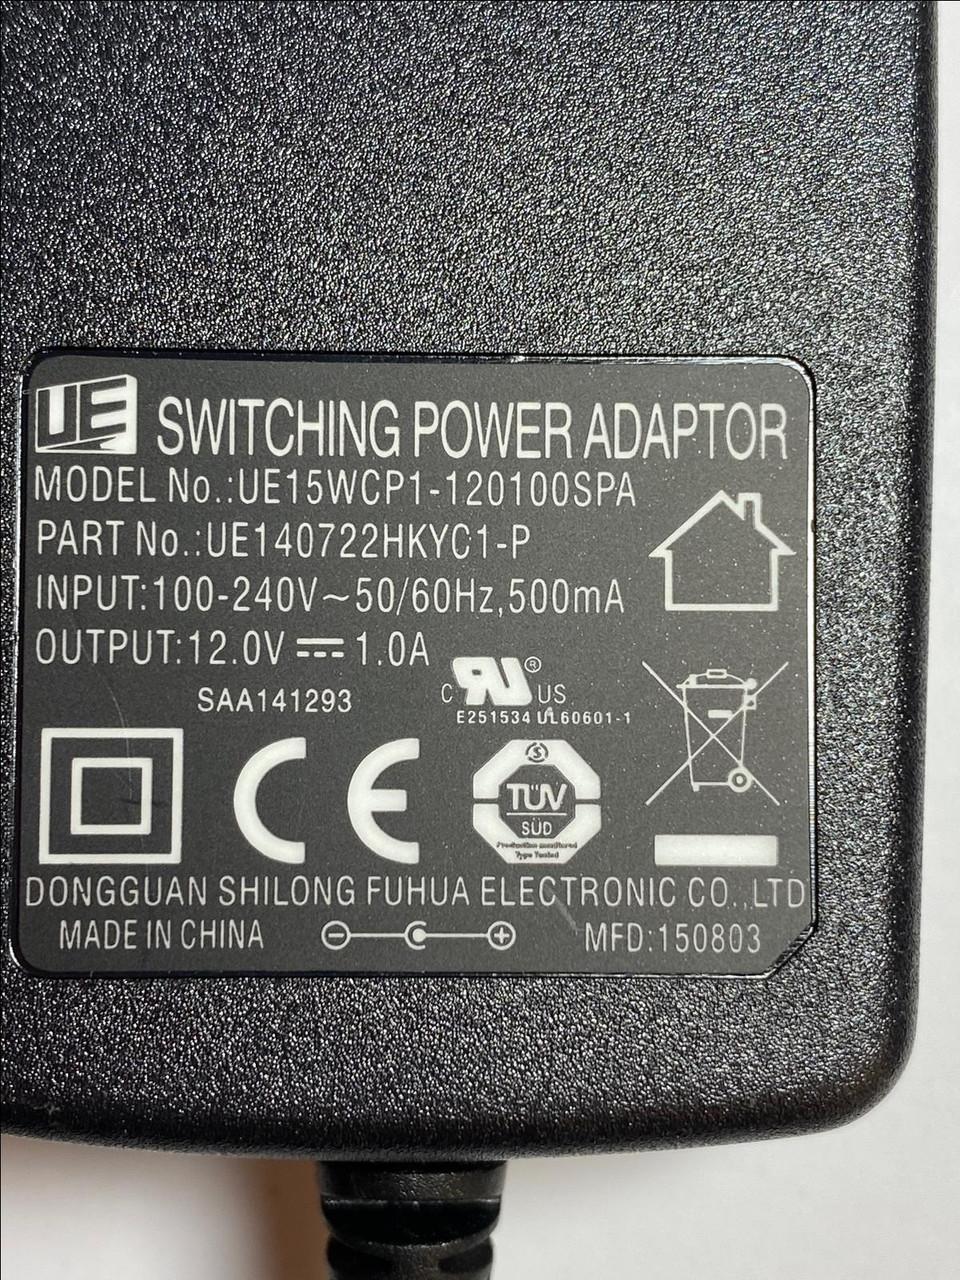 Replacement Power Supply for Model JT-DC12V1000 12VDC 1000mA EU